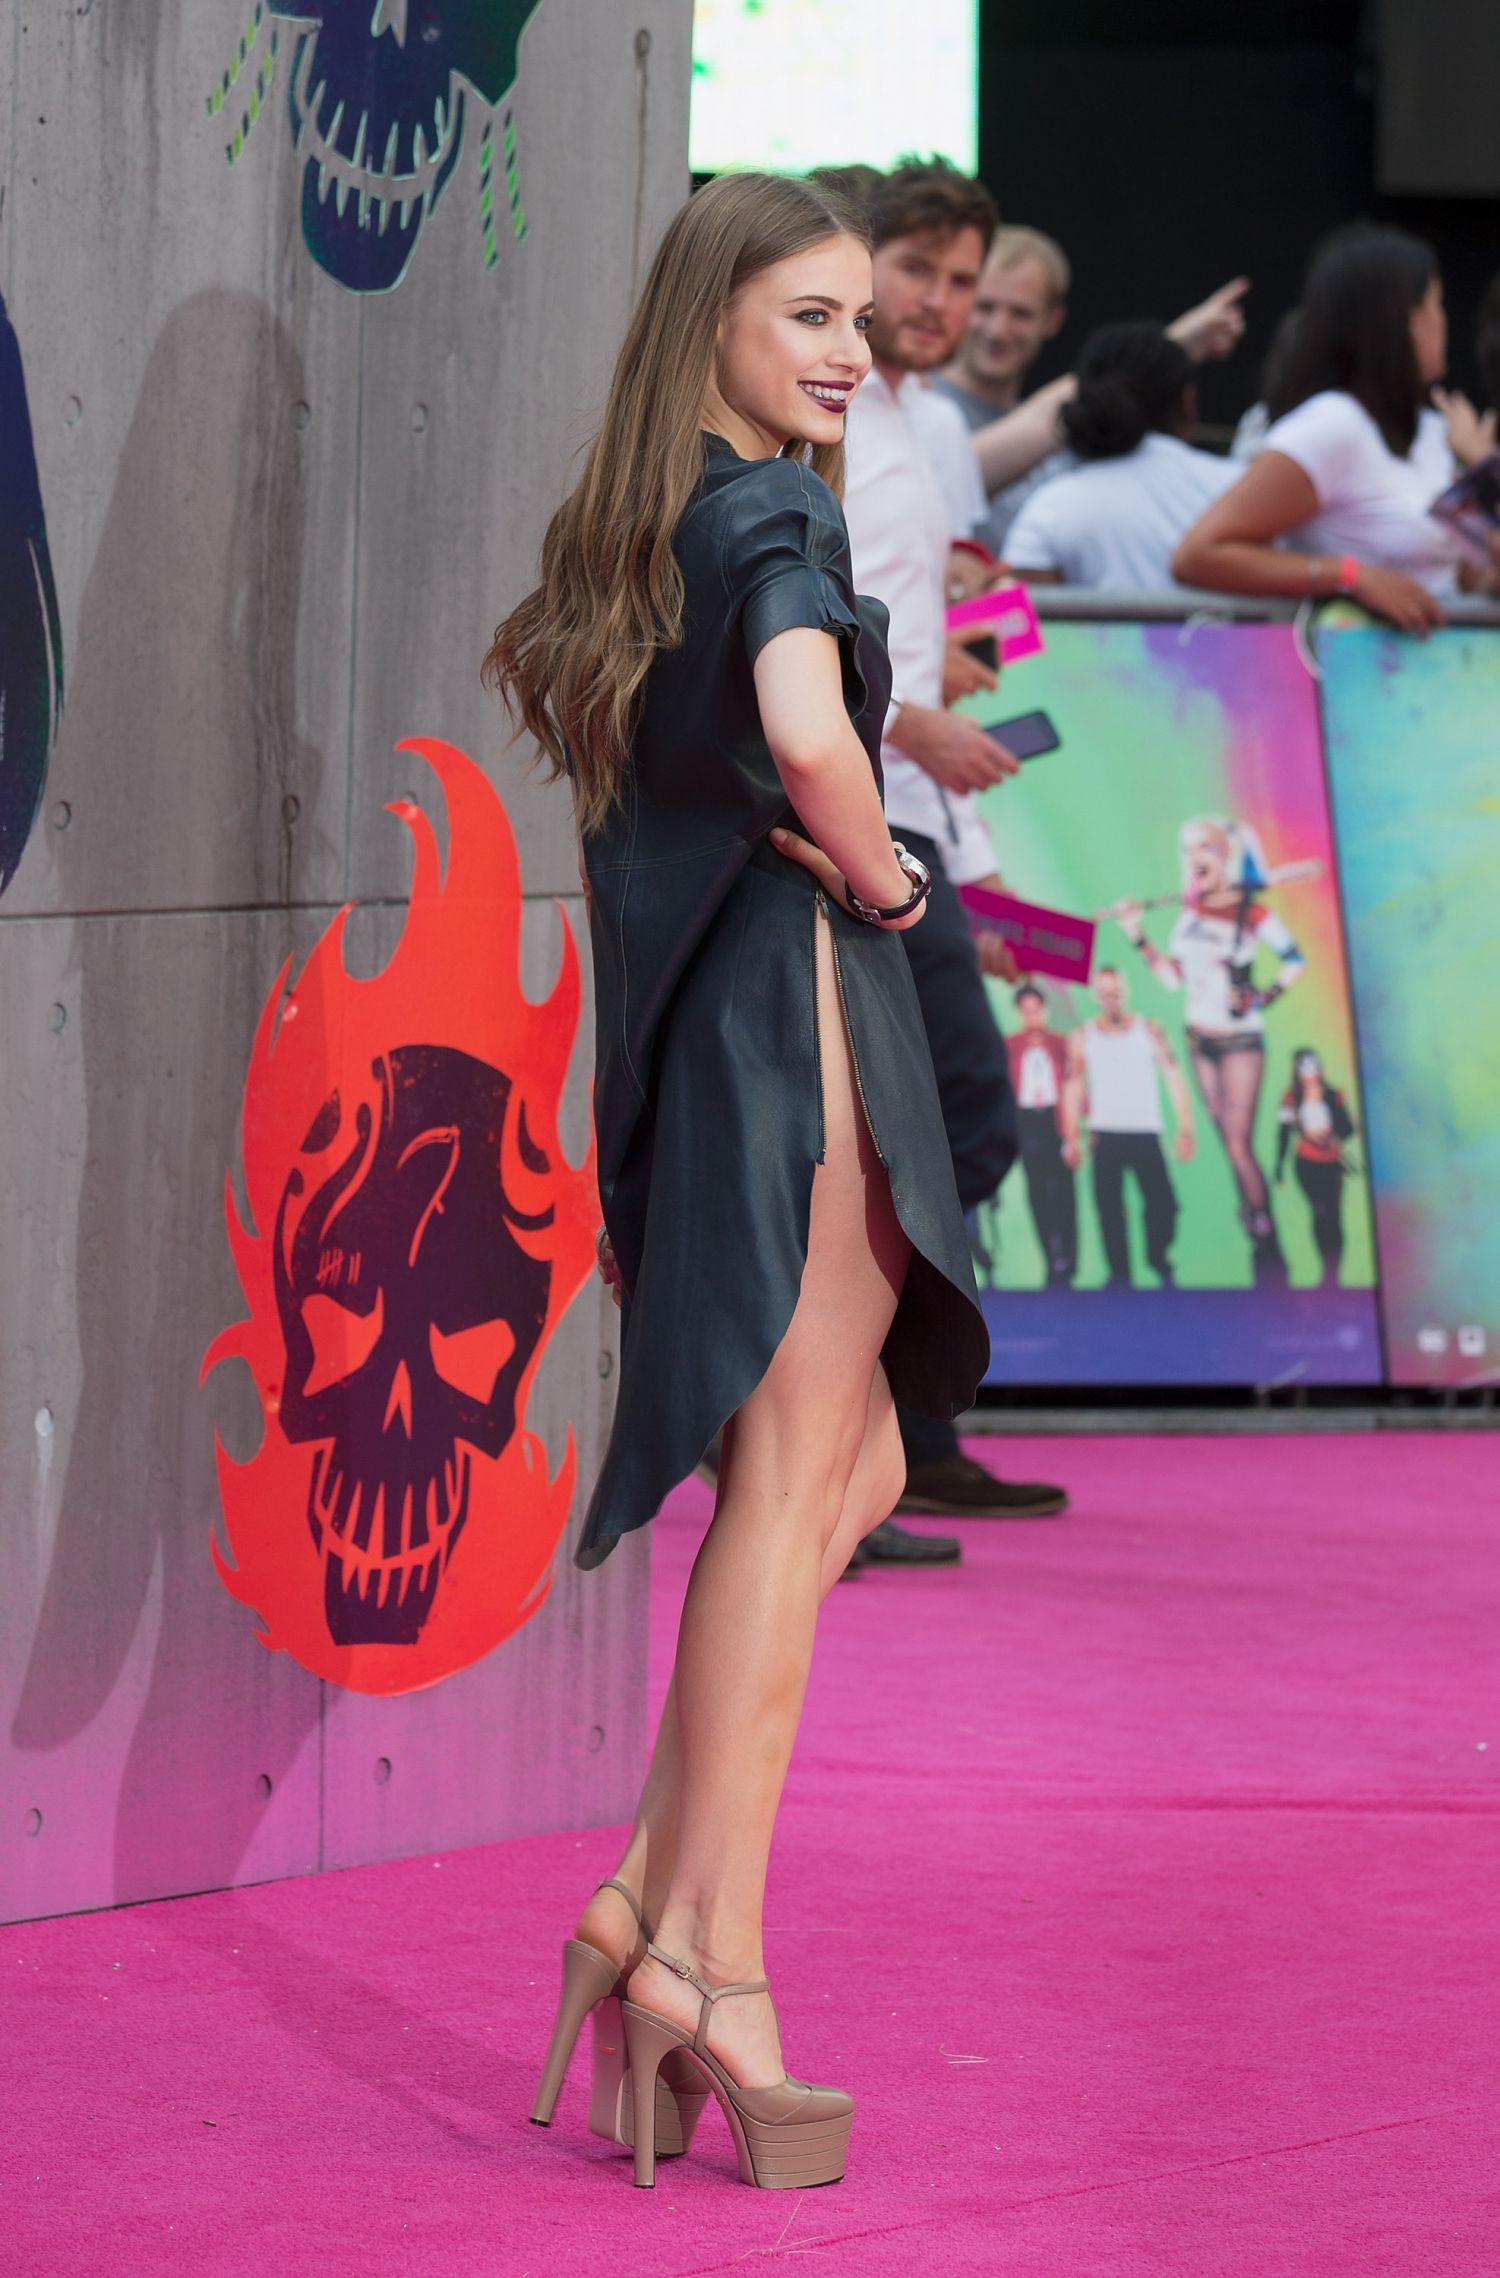 Xenia Tchoumi attends the European Premiere of Suicide Squad